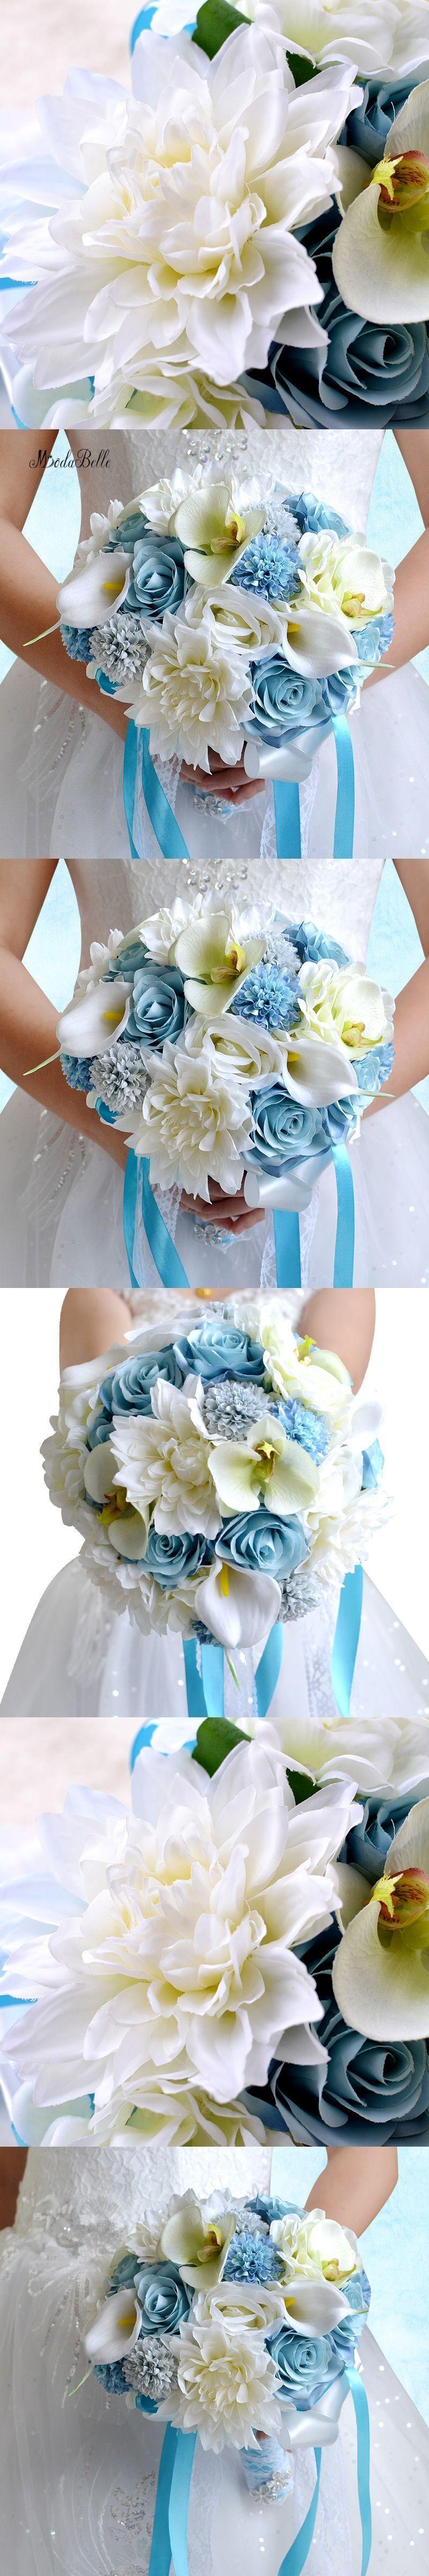 Romantic Blue Roses Beach Wedding Flowers Bouquets Bridal Brooch